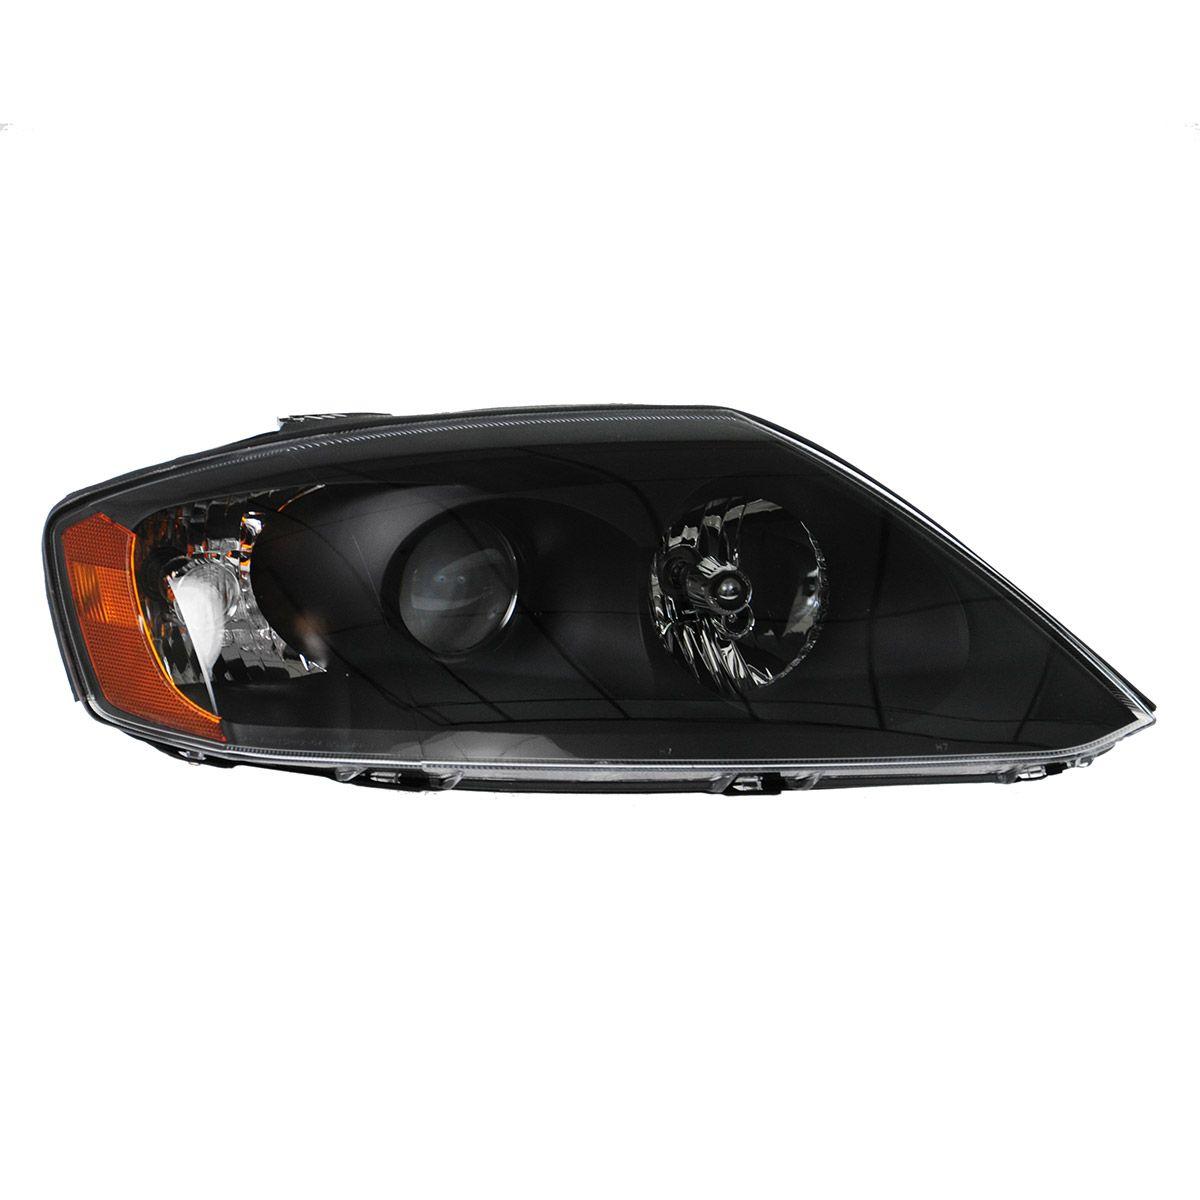 Headlight Head Lamp Rh Right Passenger Side For 06 Hyundai Tiburon